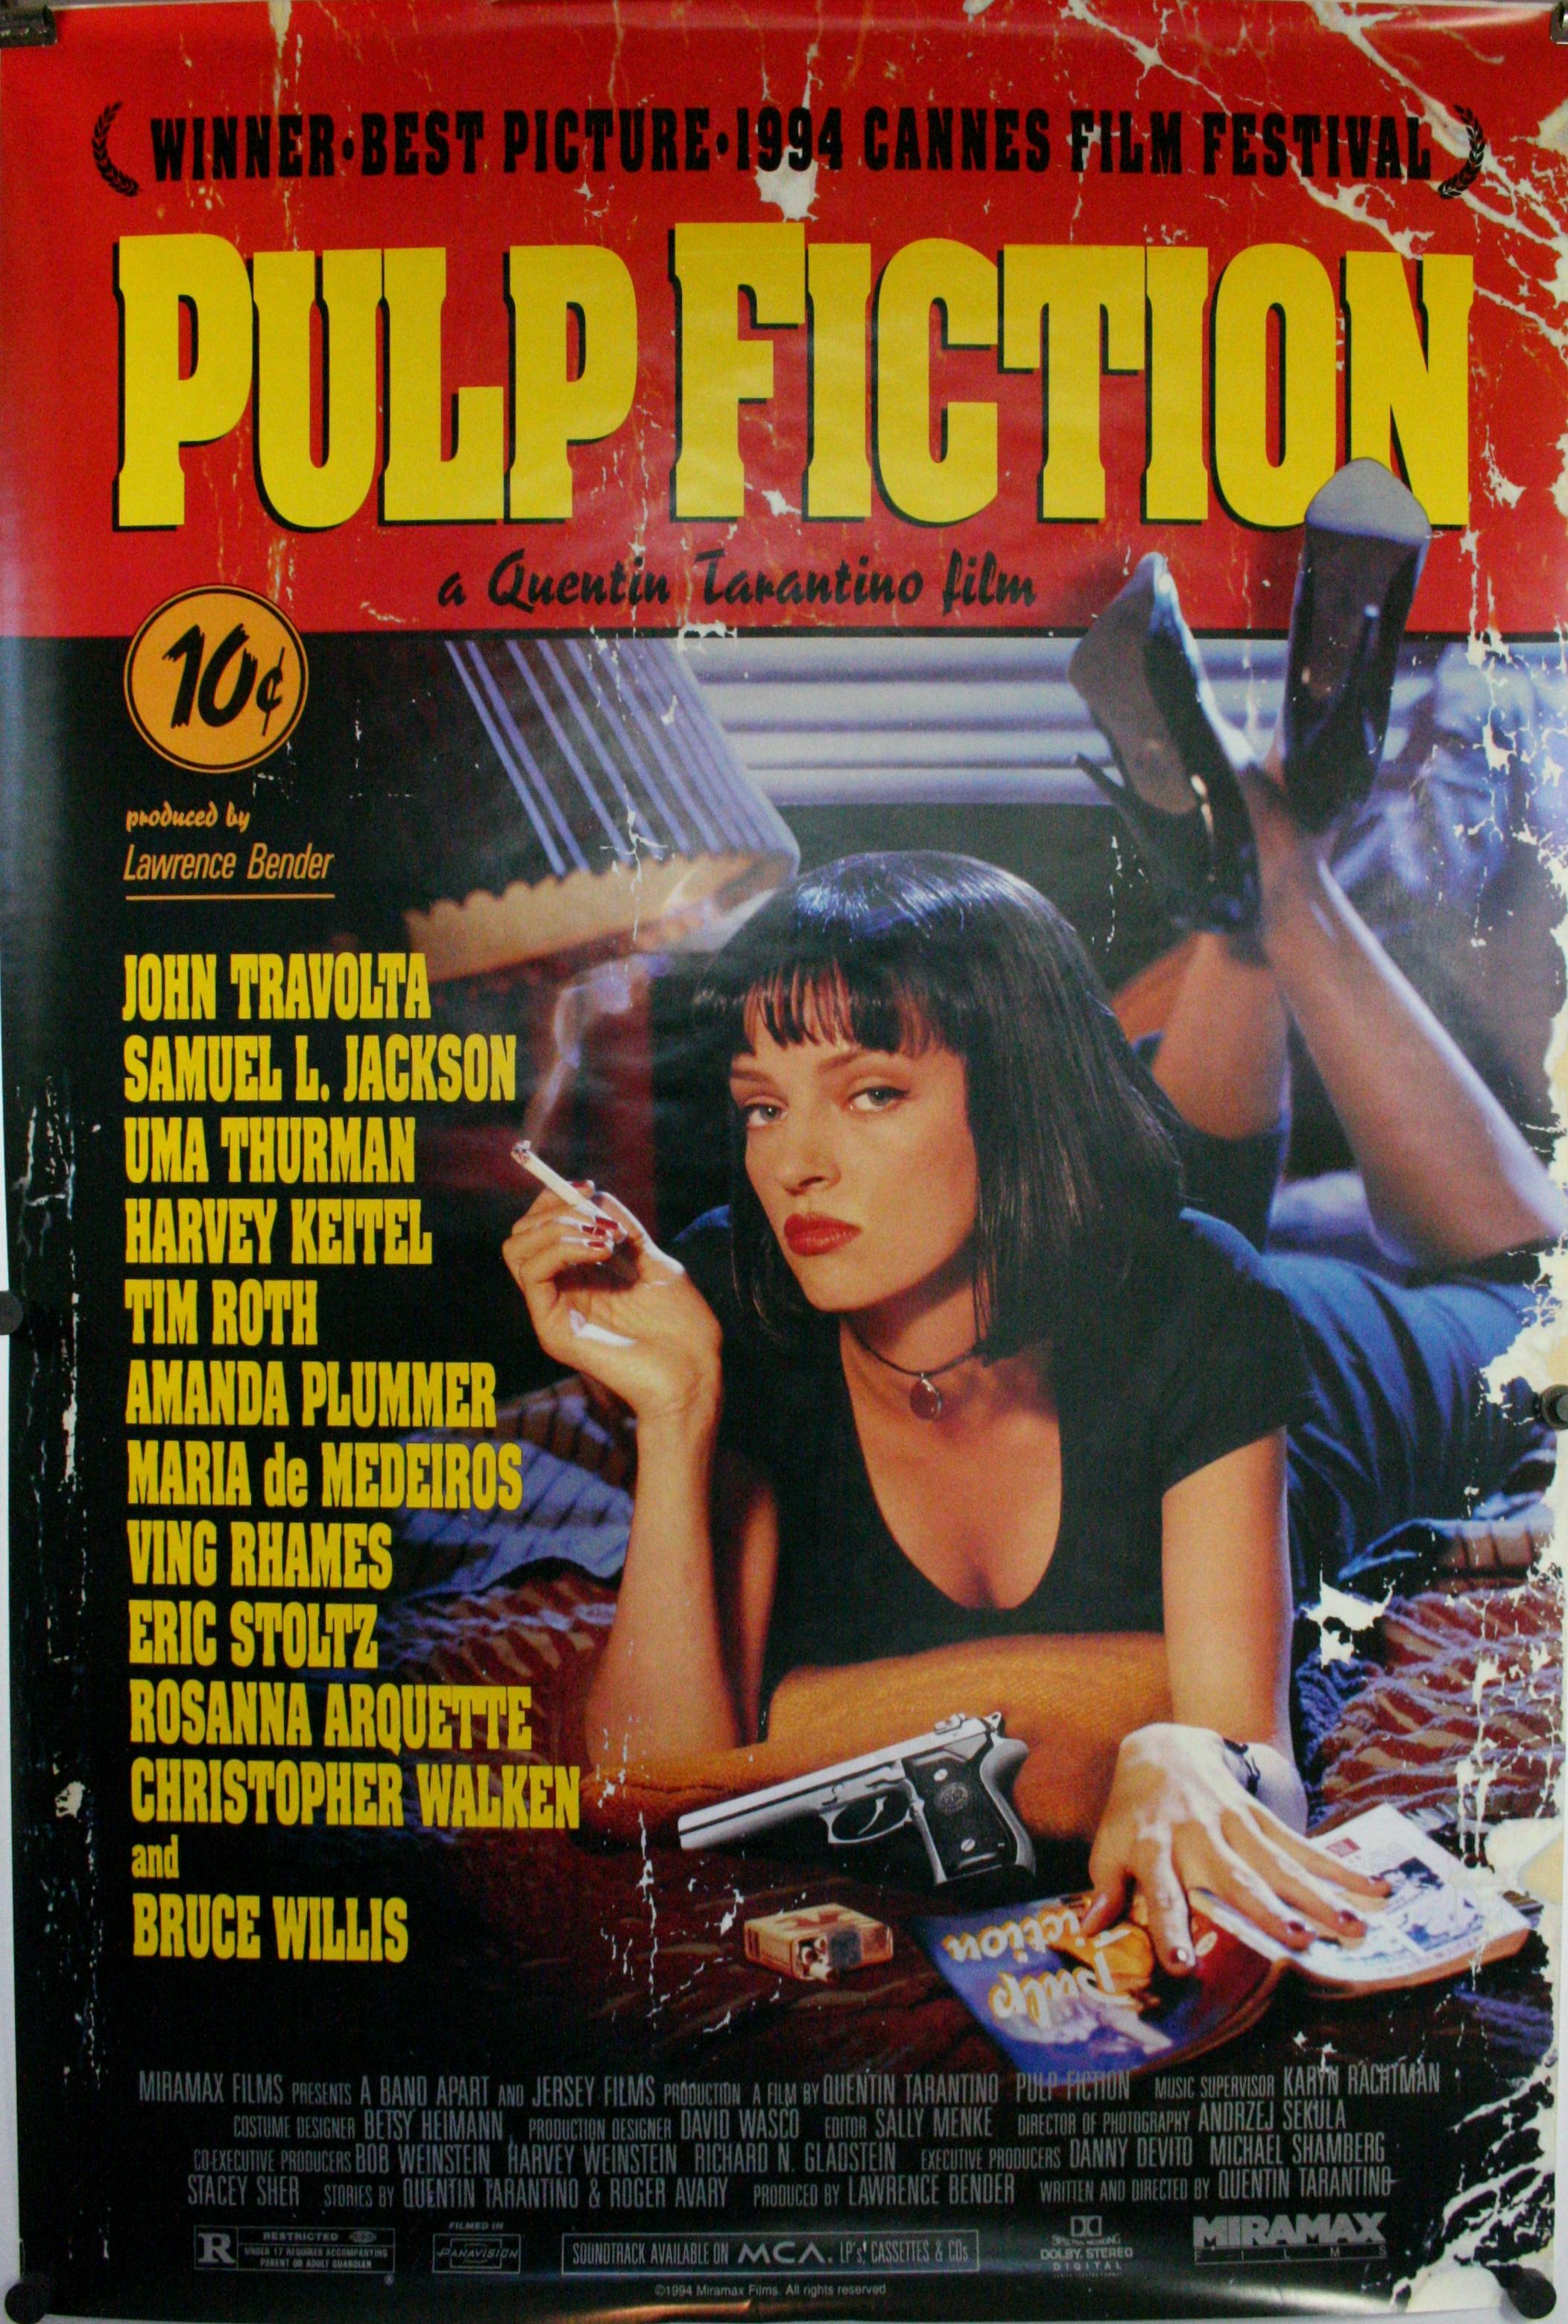 PULP-FICTION-2100.jpg